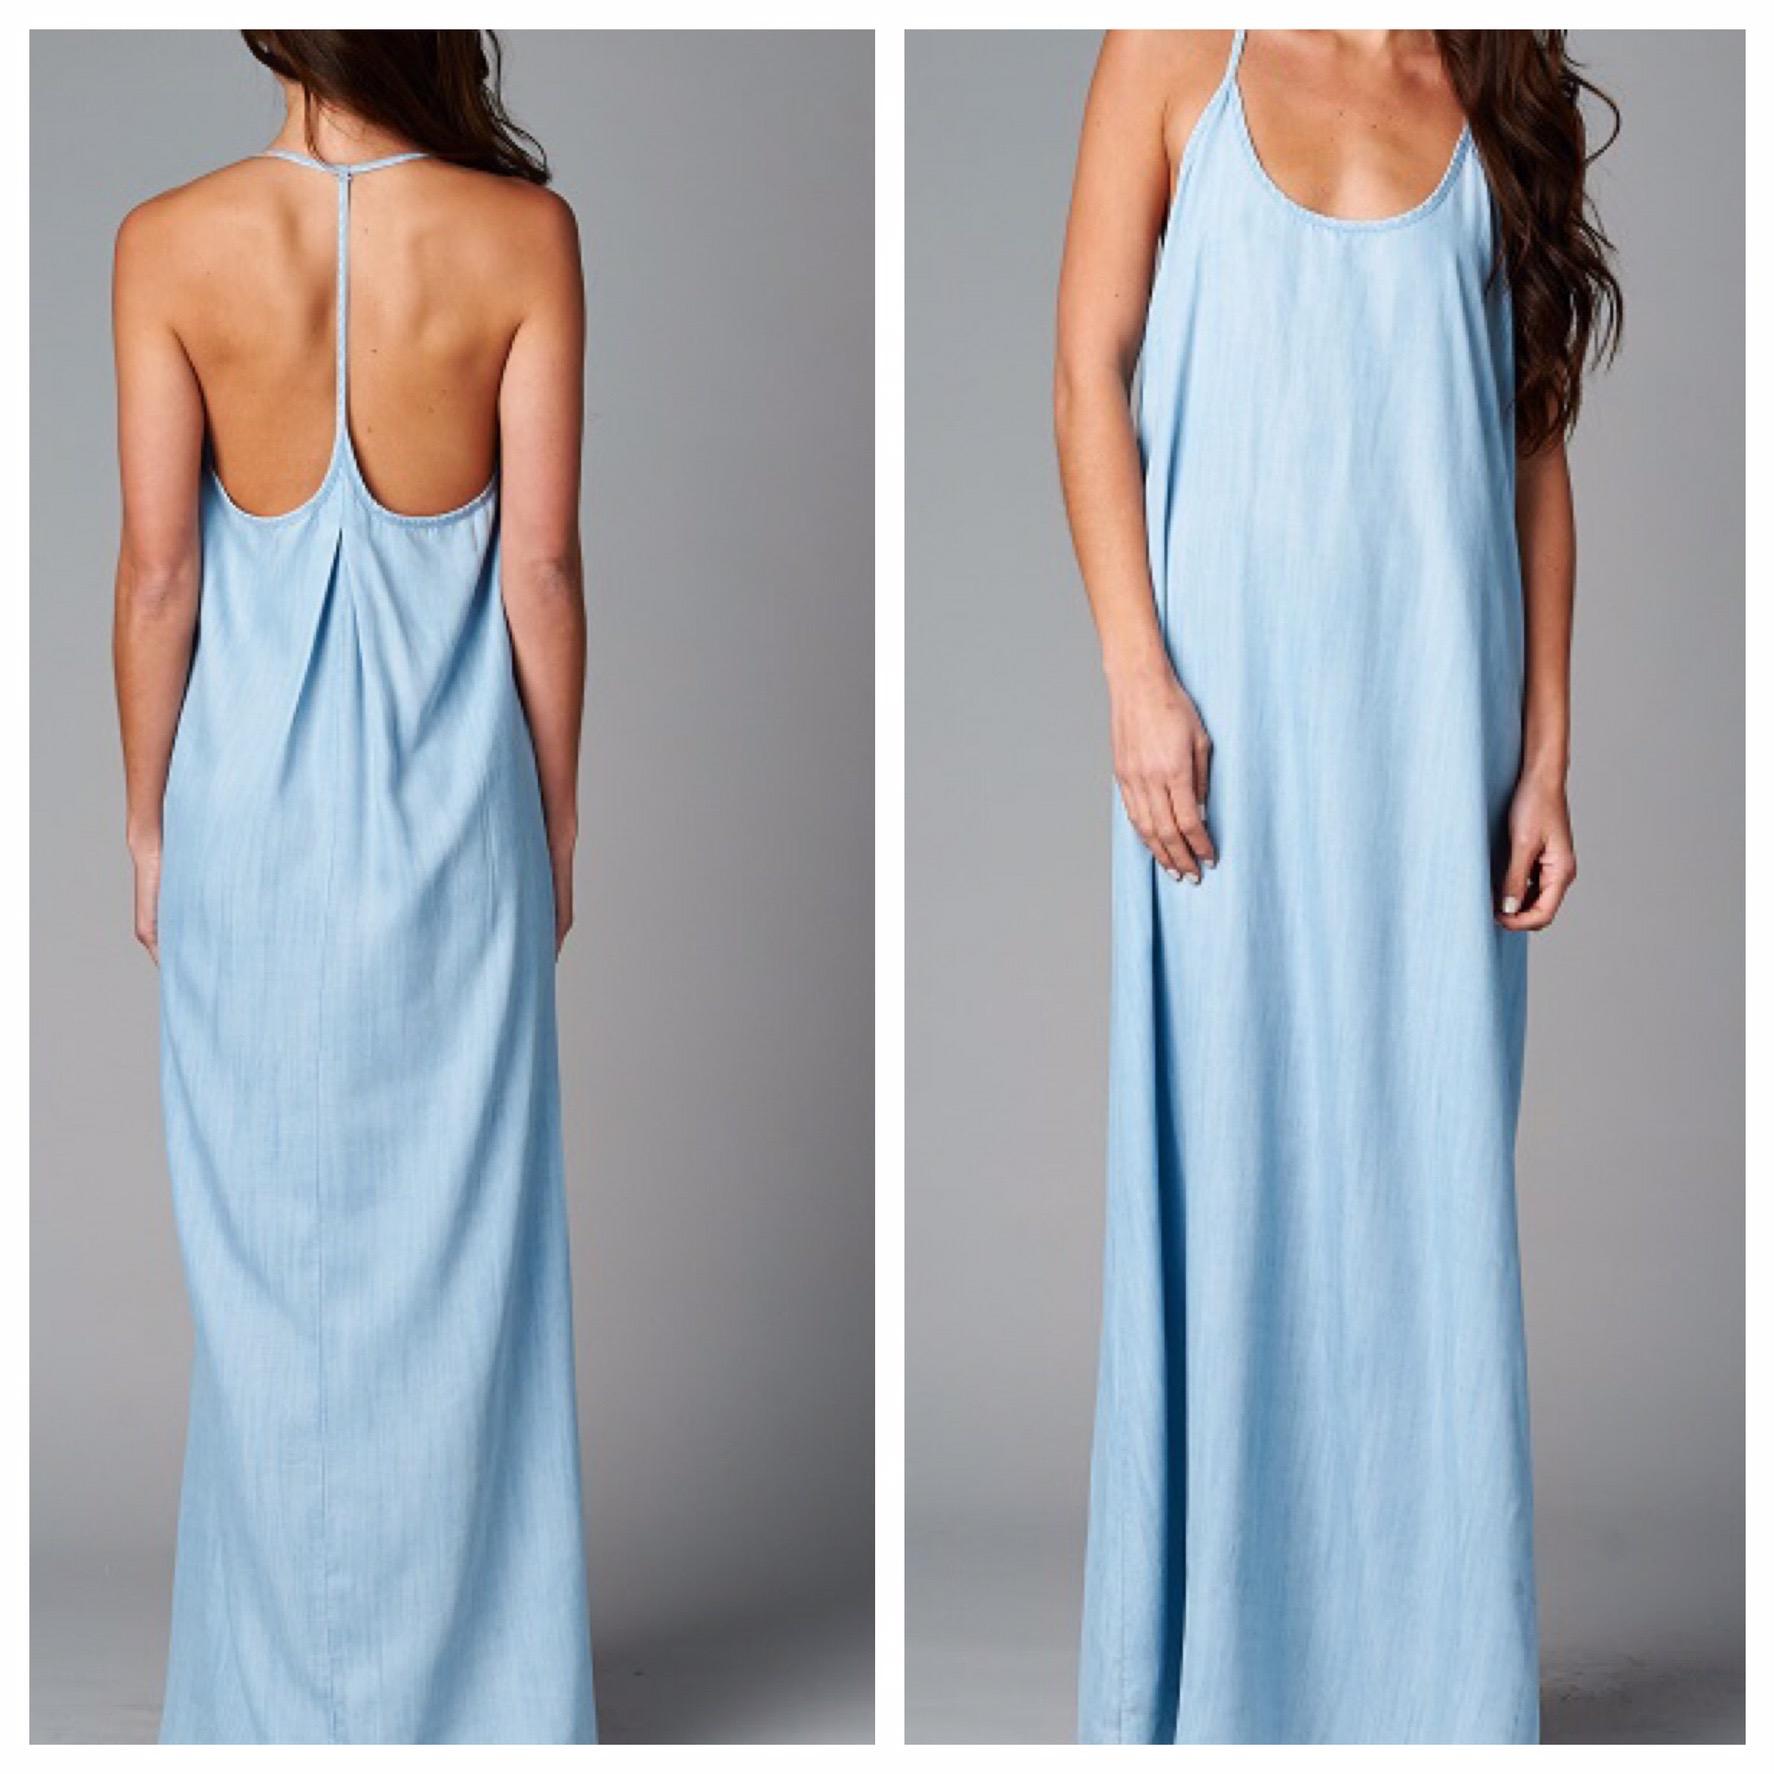 stilo stream dress